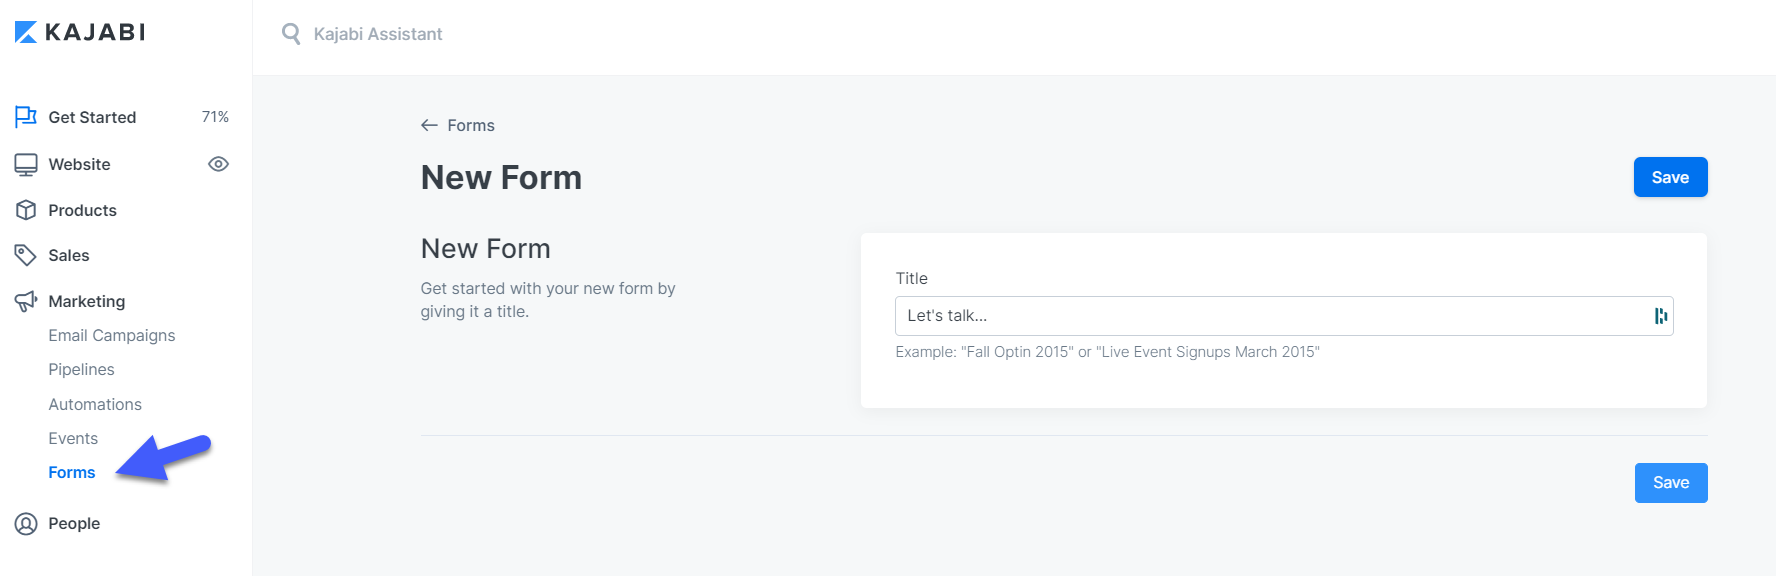 Screenshot of the Kajabi app form builder